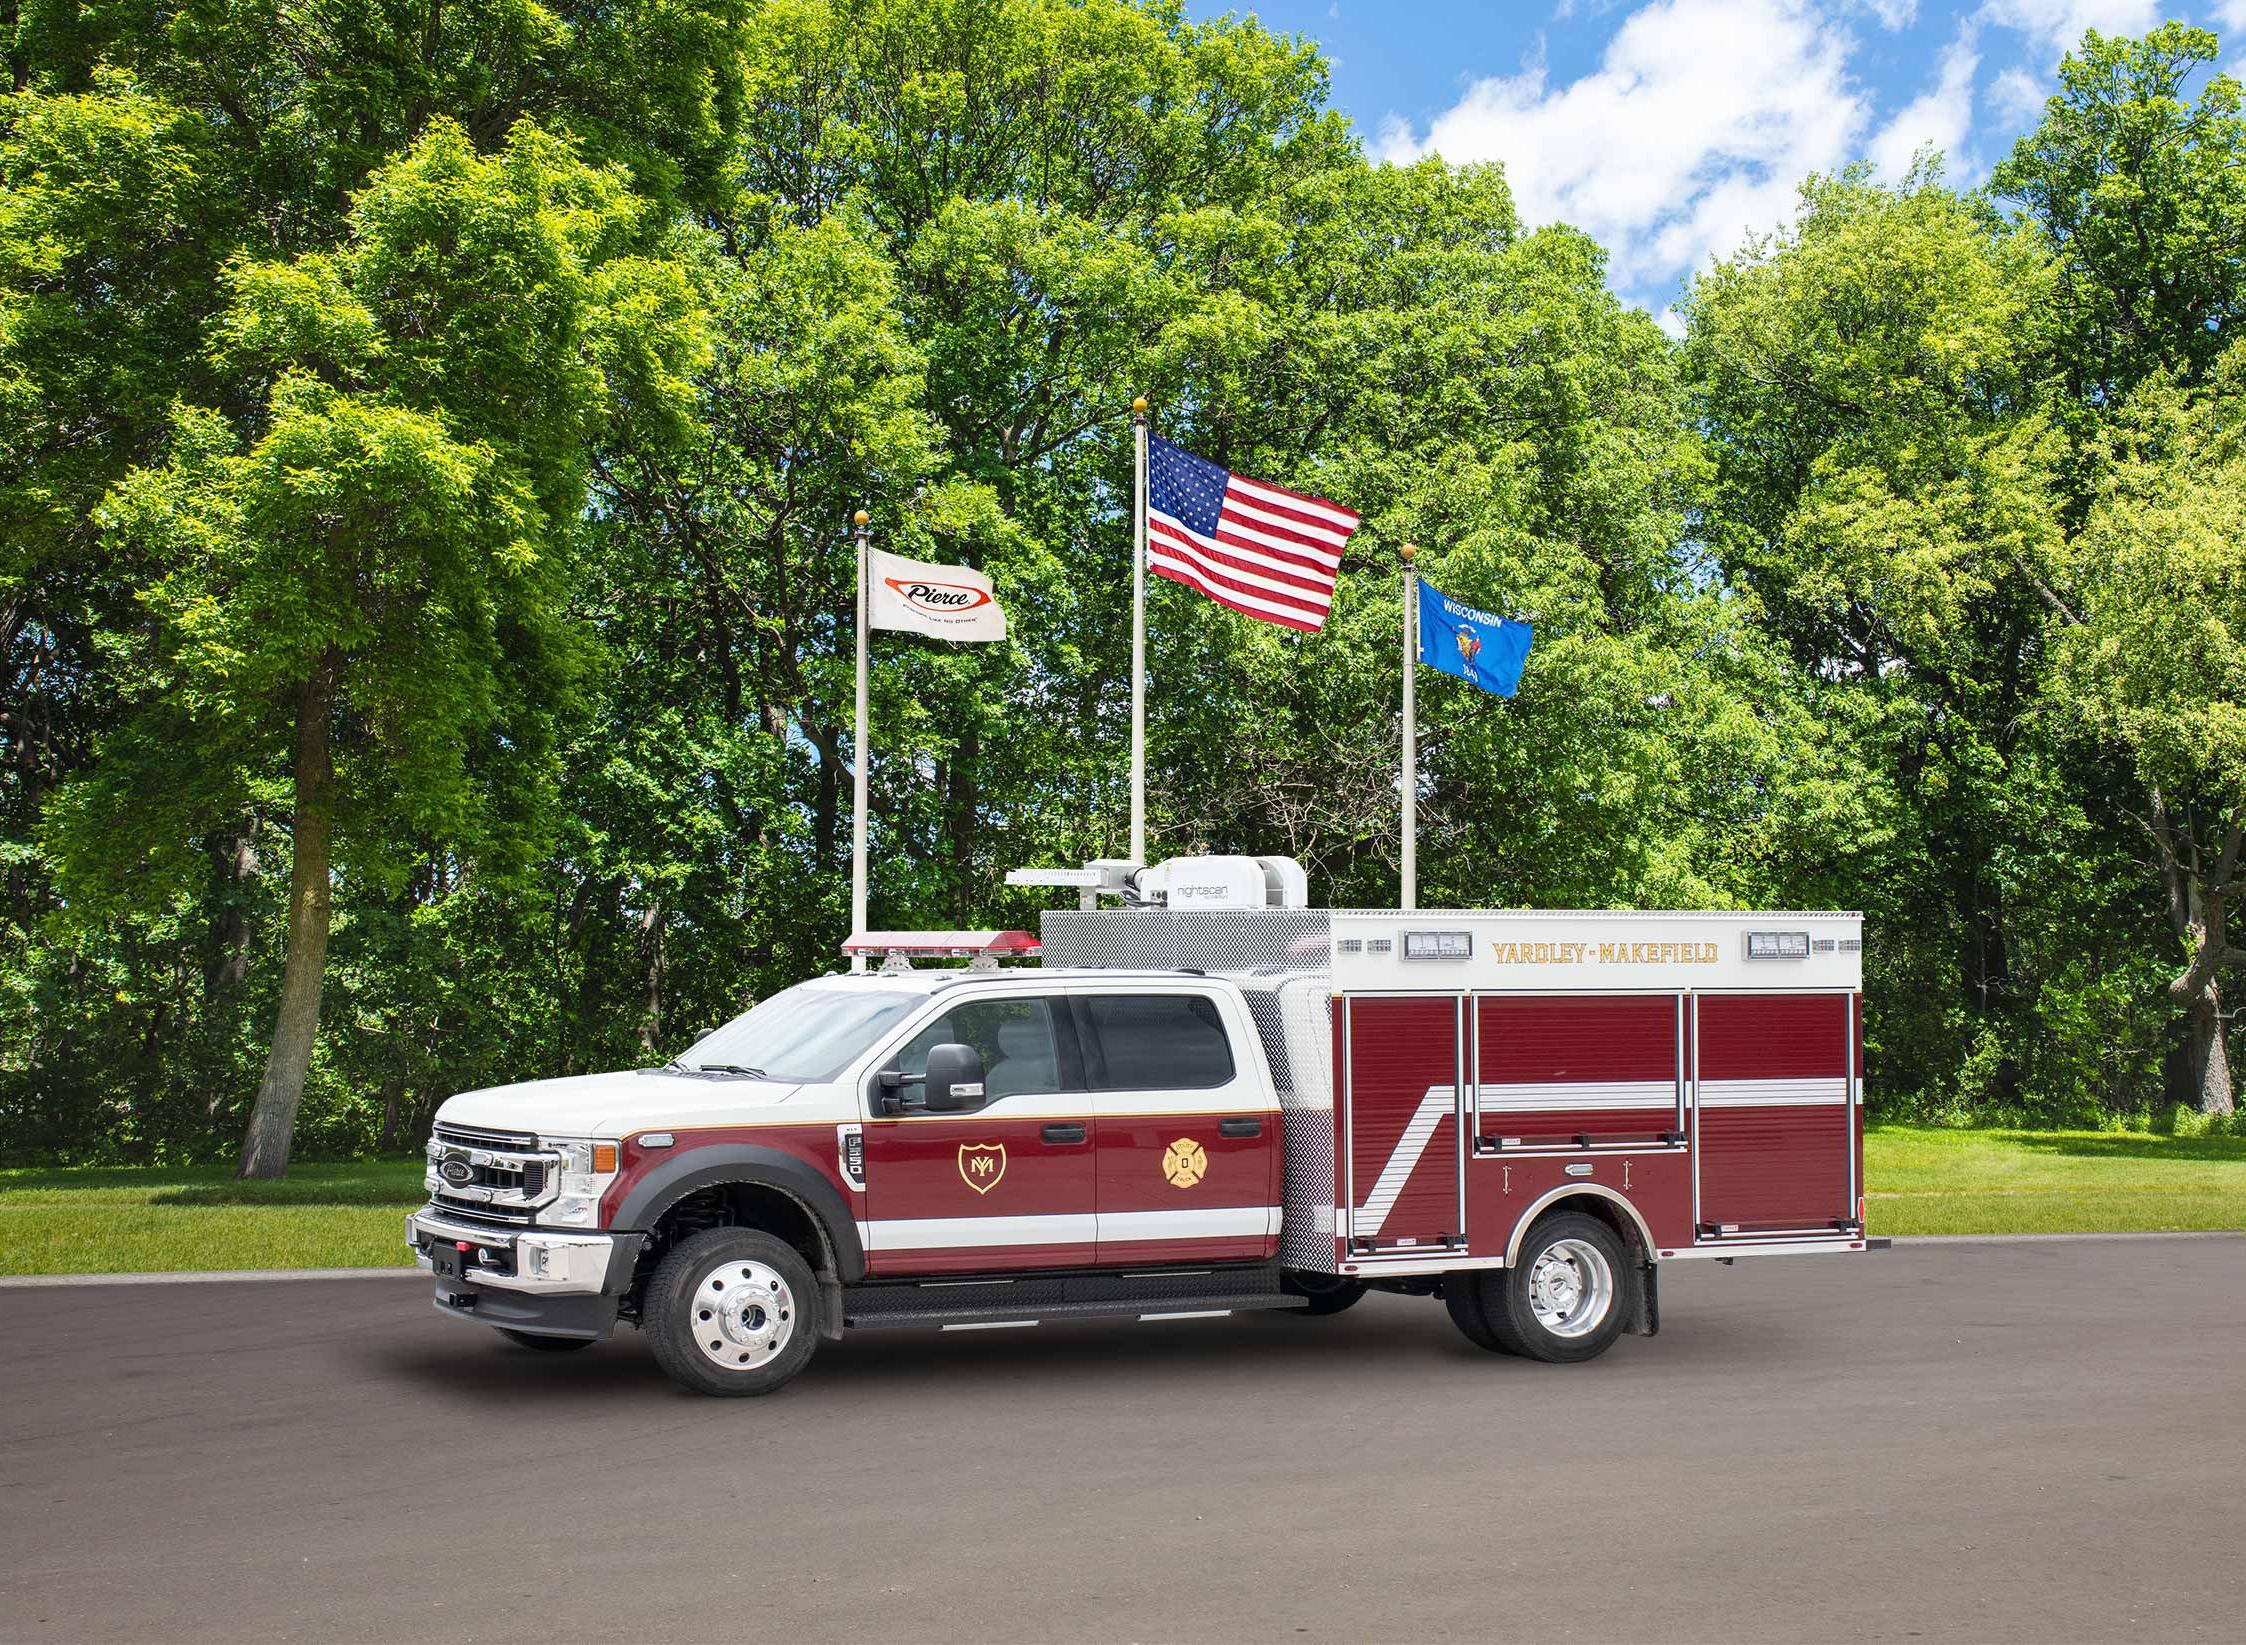 Yardley-Makefield Fire Company - Pumper